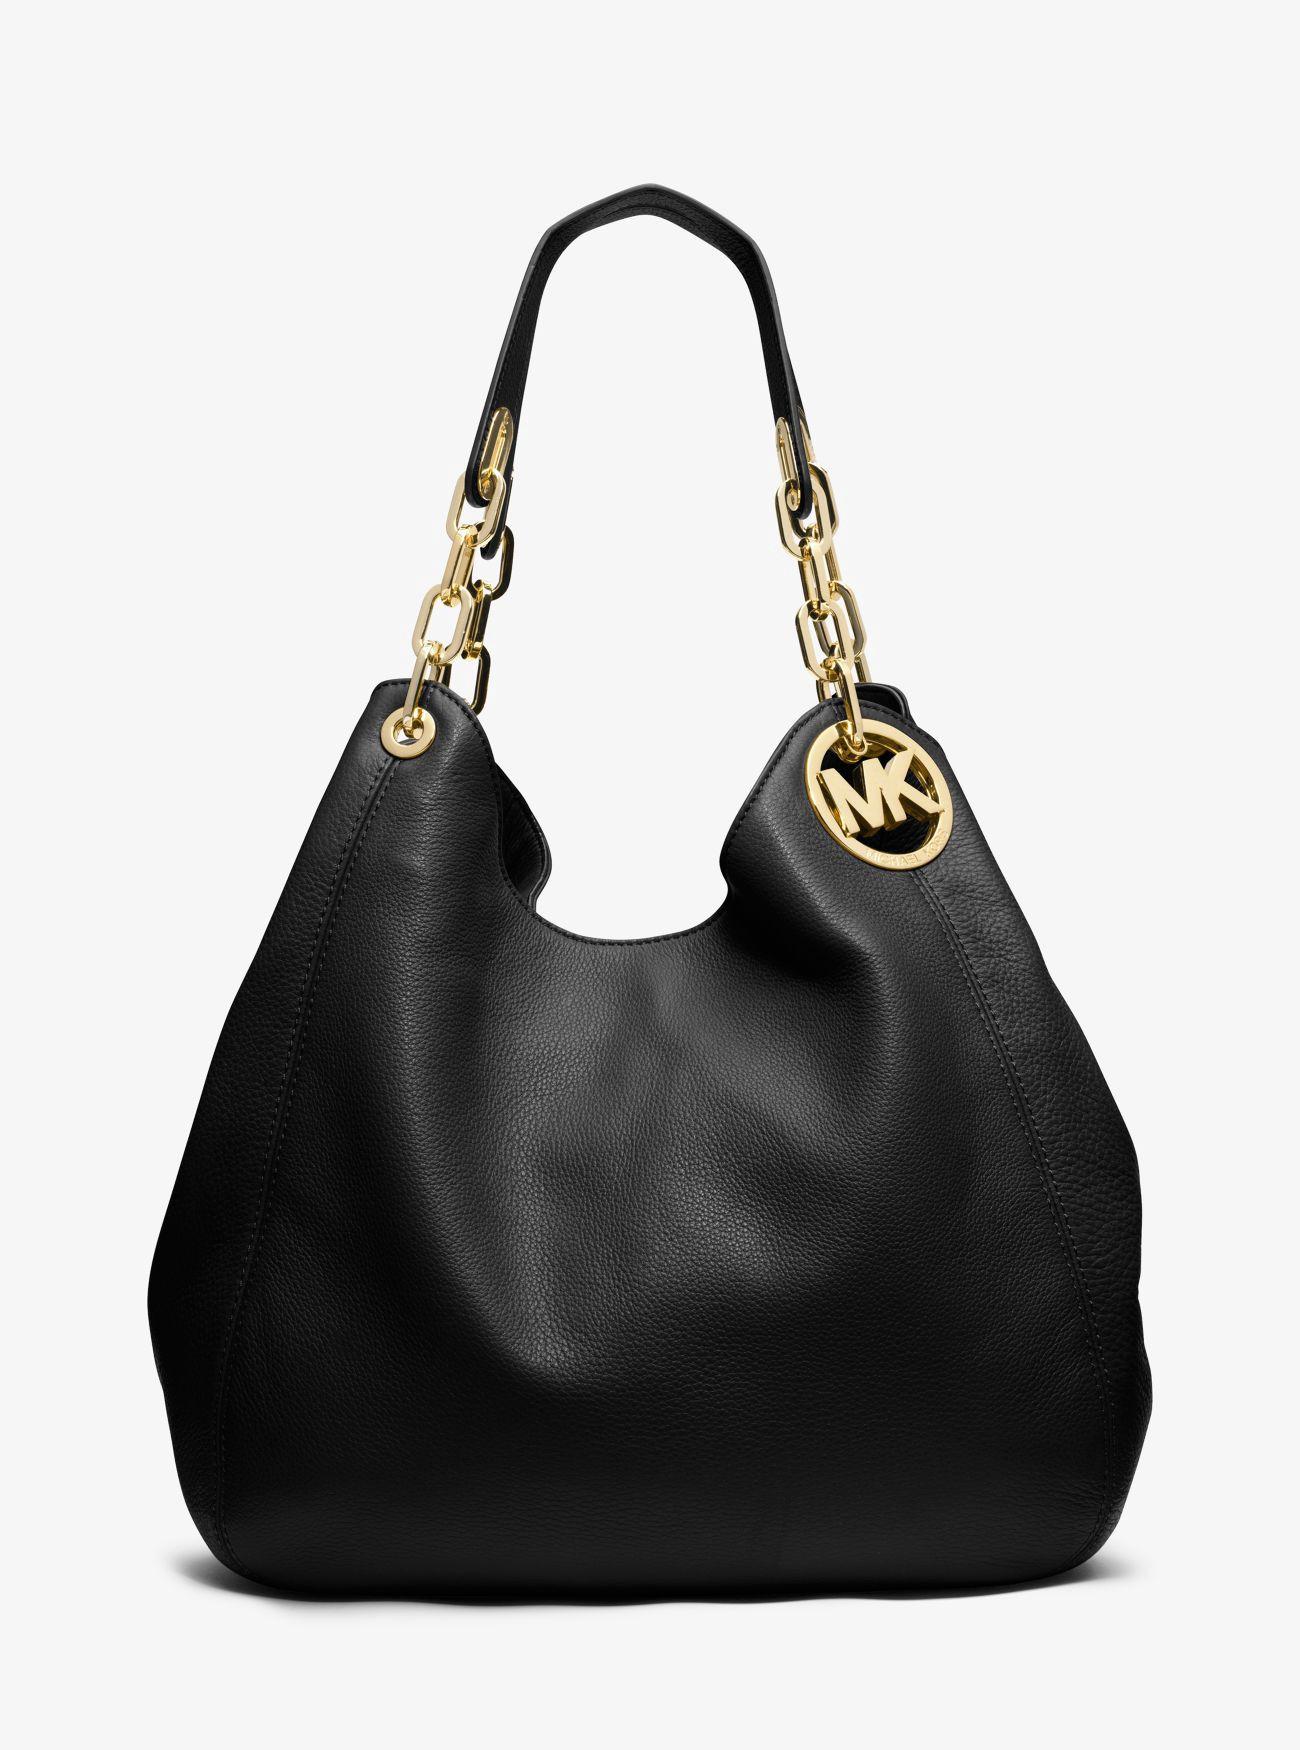 65cfea166c MICHAEL KORS Fulton Large Leather Shoulder Bag.  michaelkors  bags   polyester  leather  lining  denim  shoulder bags  hand bags